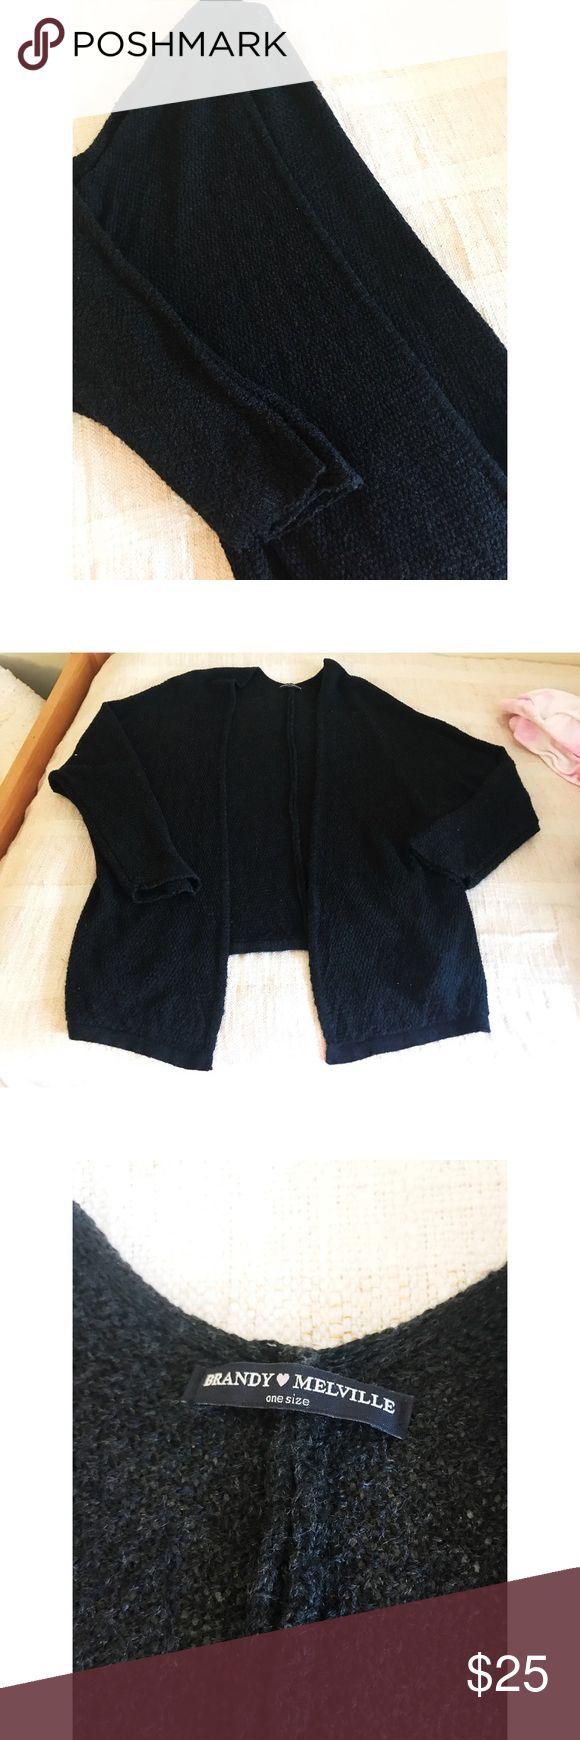 Brandy Melville Cardigan • n e w • Brandy Melville Sweaters Cardigans